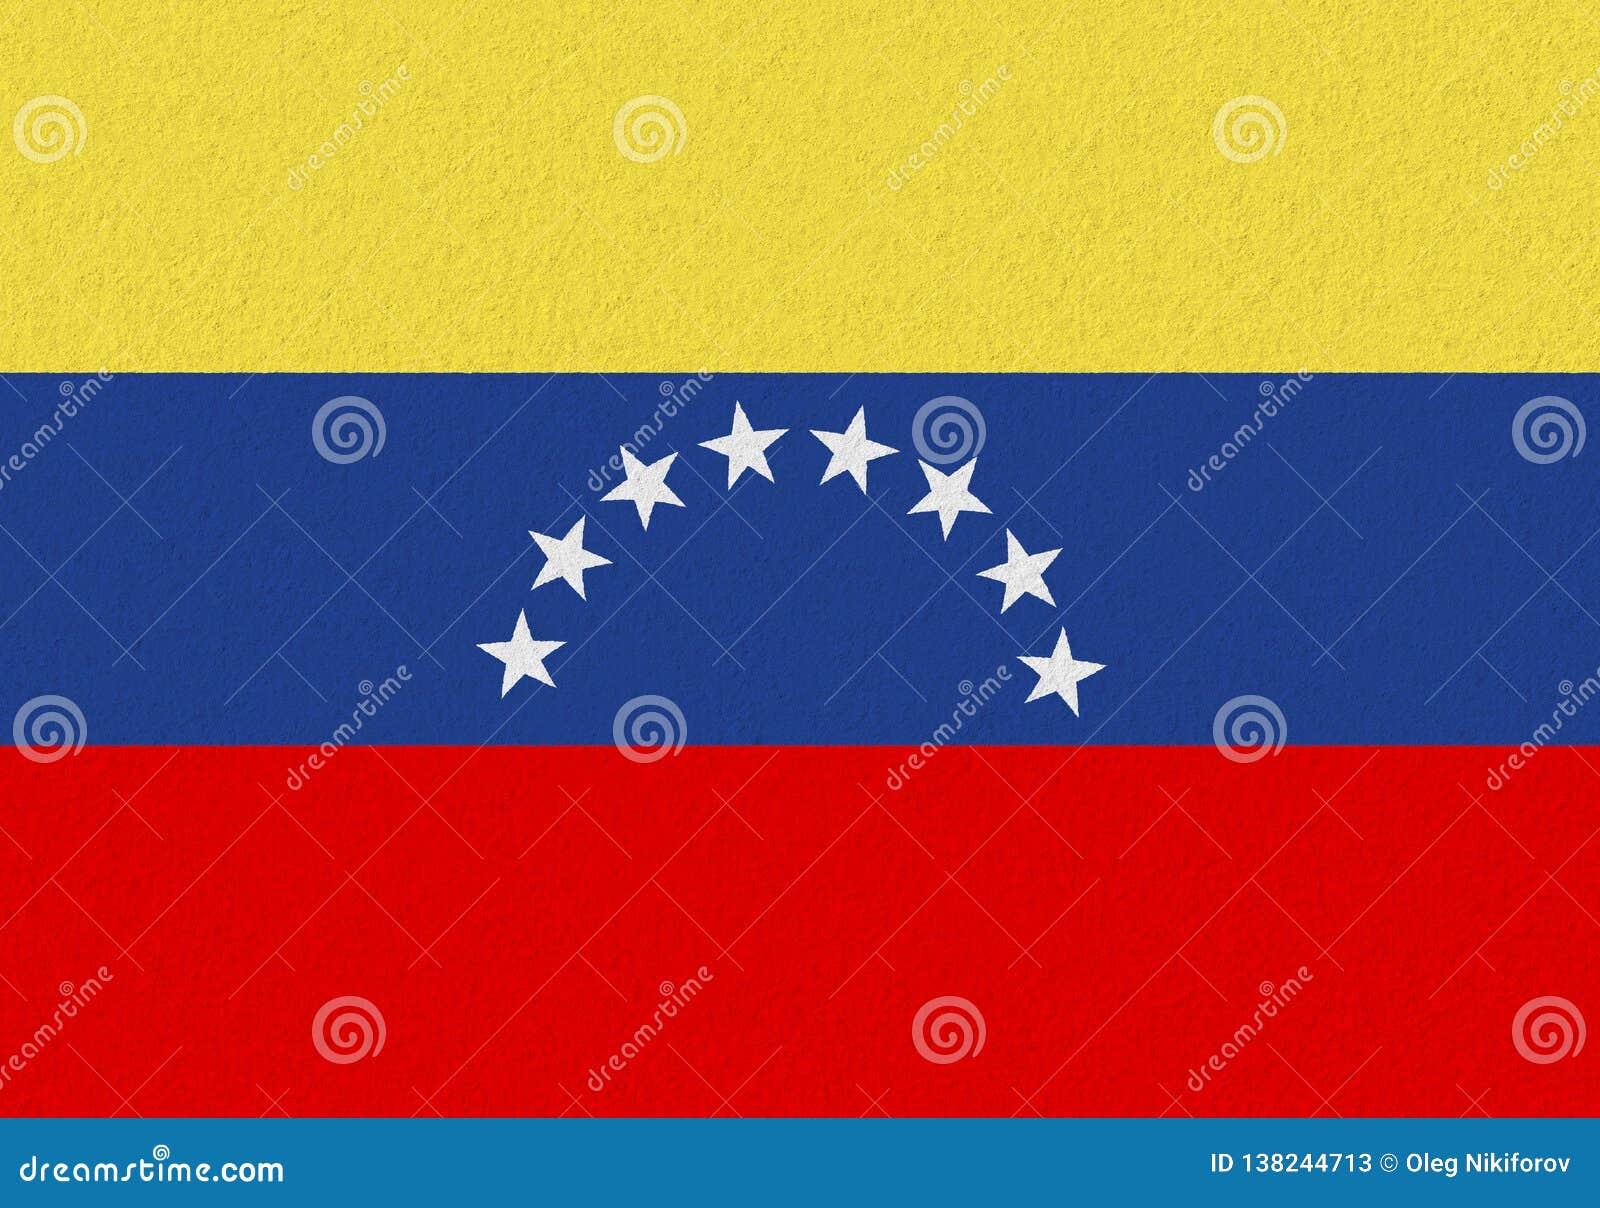 Venezuela paper flag